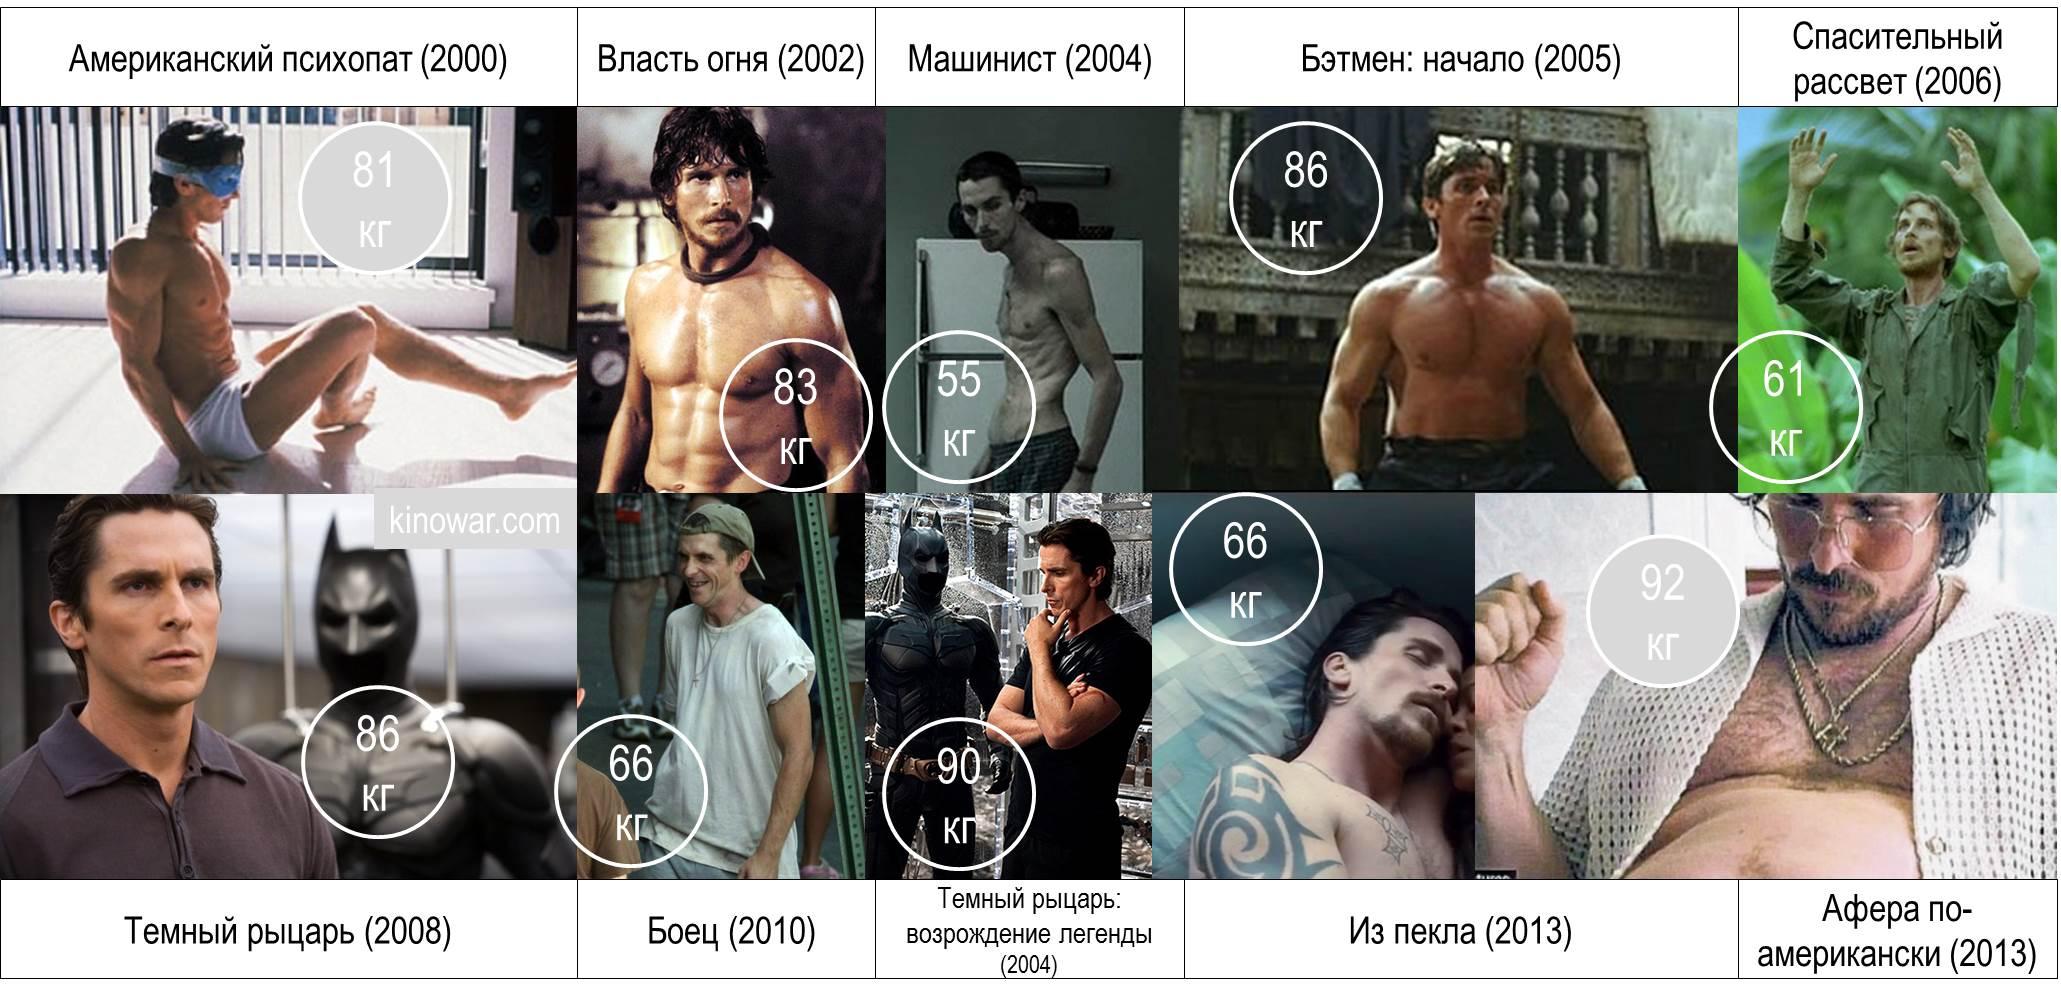 Трансформация веса тела Кристиана Бэйла в его фильмах Christian Bale weight changes